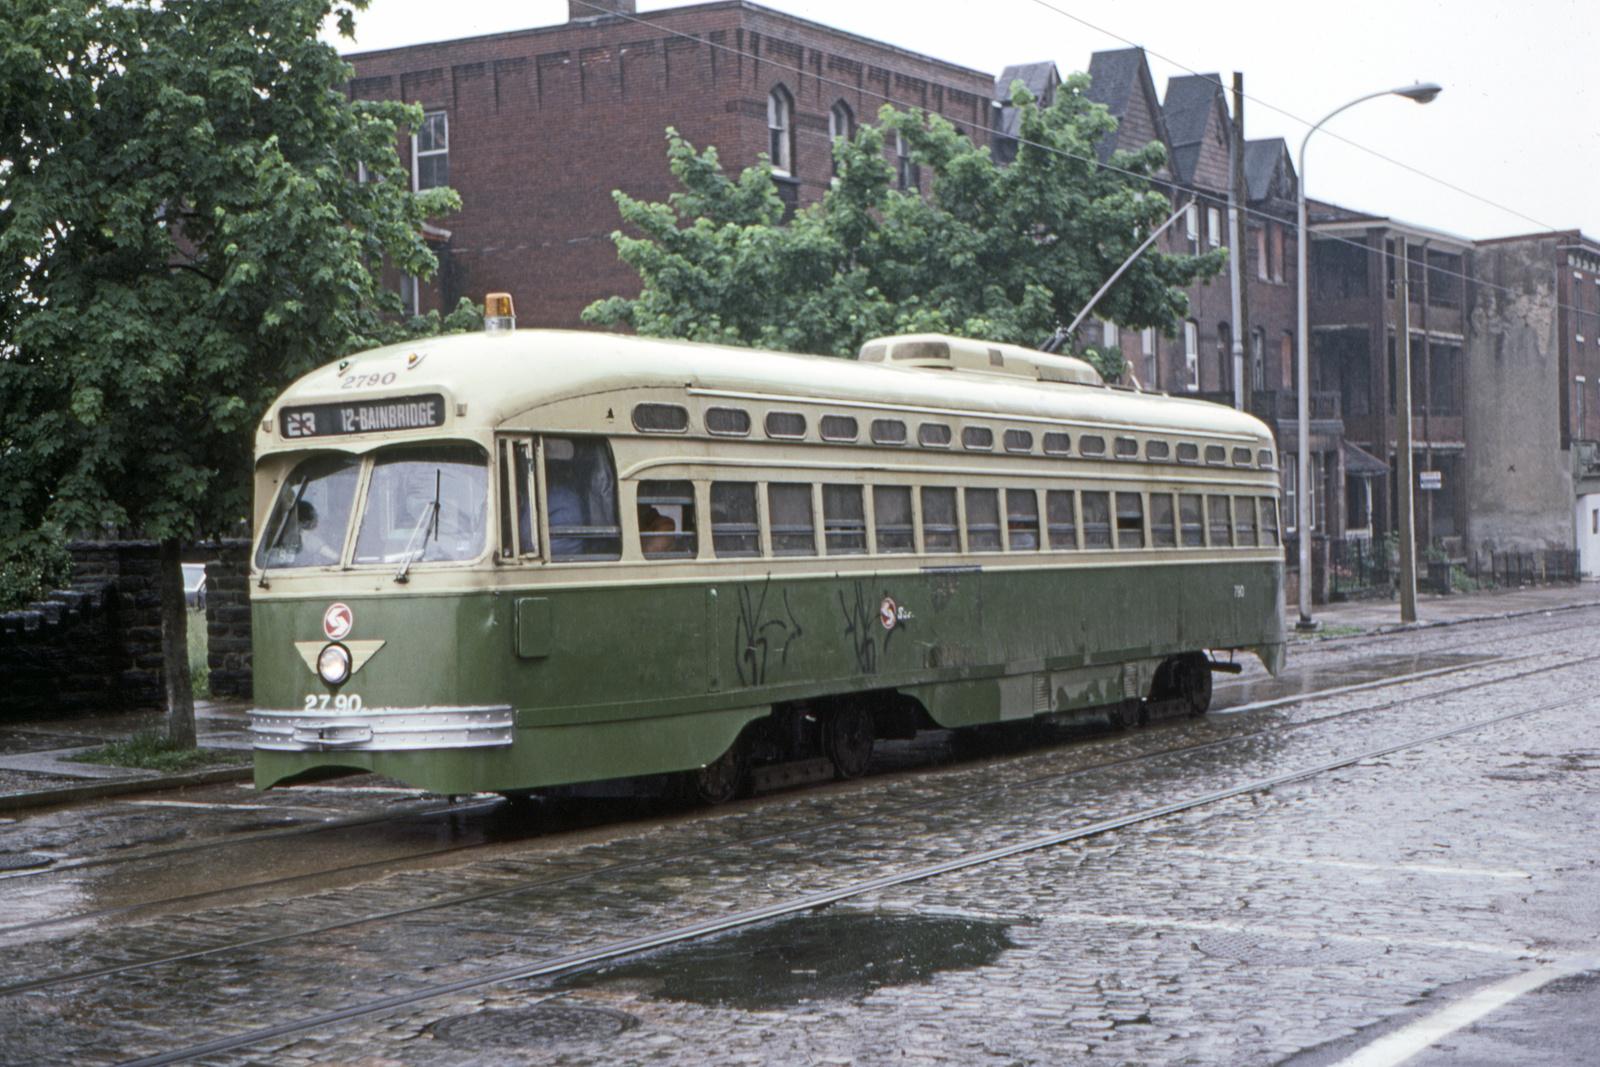 (797k, 1600x1067)<br><b>Country:</b> United States<br><b>City:</b> Philadelphia, PA<br><b>System:</b> SEPTA (or Predecessor)<br><b>Line:</b> Rt. 23-Germantown<br><b>Location:</b> Germantown/Logan<br><b>Car:</b> PTC/SEPTA Postwar All-electric PCC (St.Louis, 1947) 2790 <br><b>Collection of:</b> David Pirmann<br><b>Date:</b> 5/22/1983<br><b>Viewed (this week/total):</b> 0 / 47